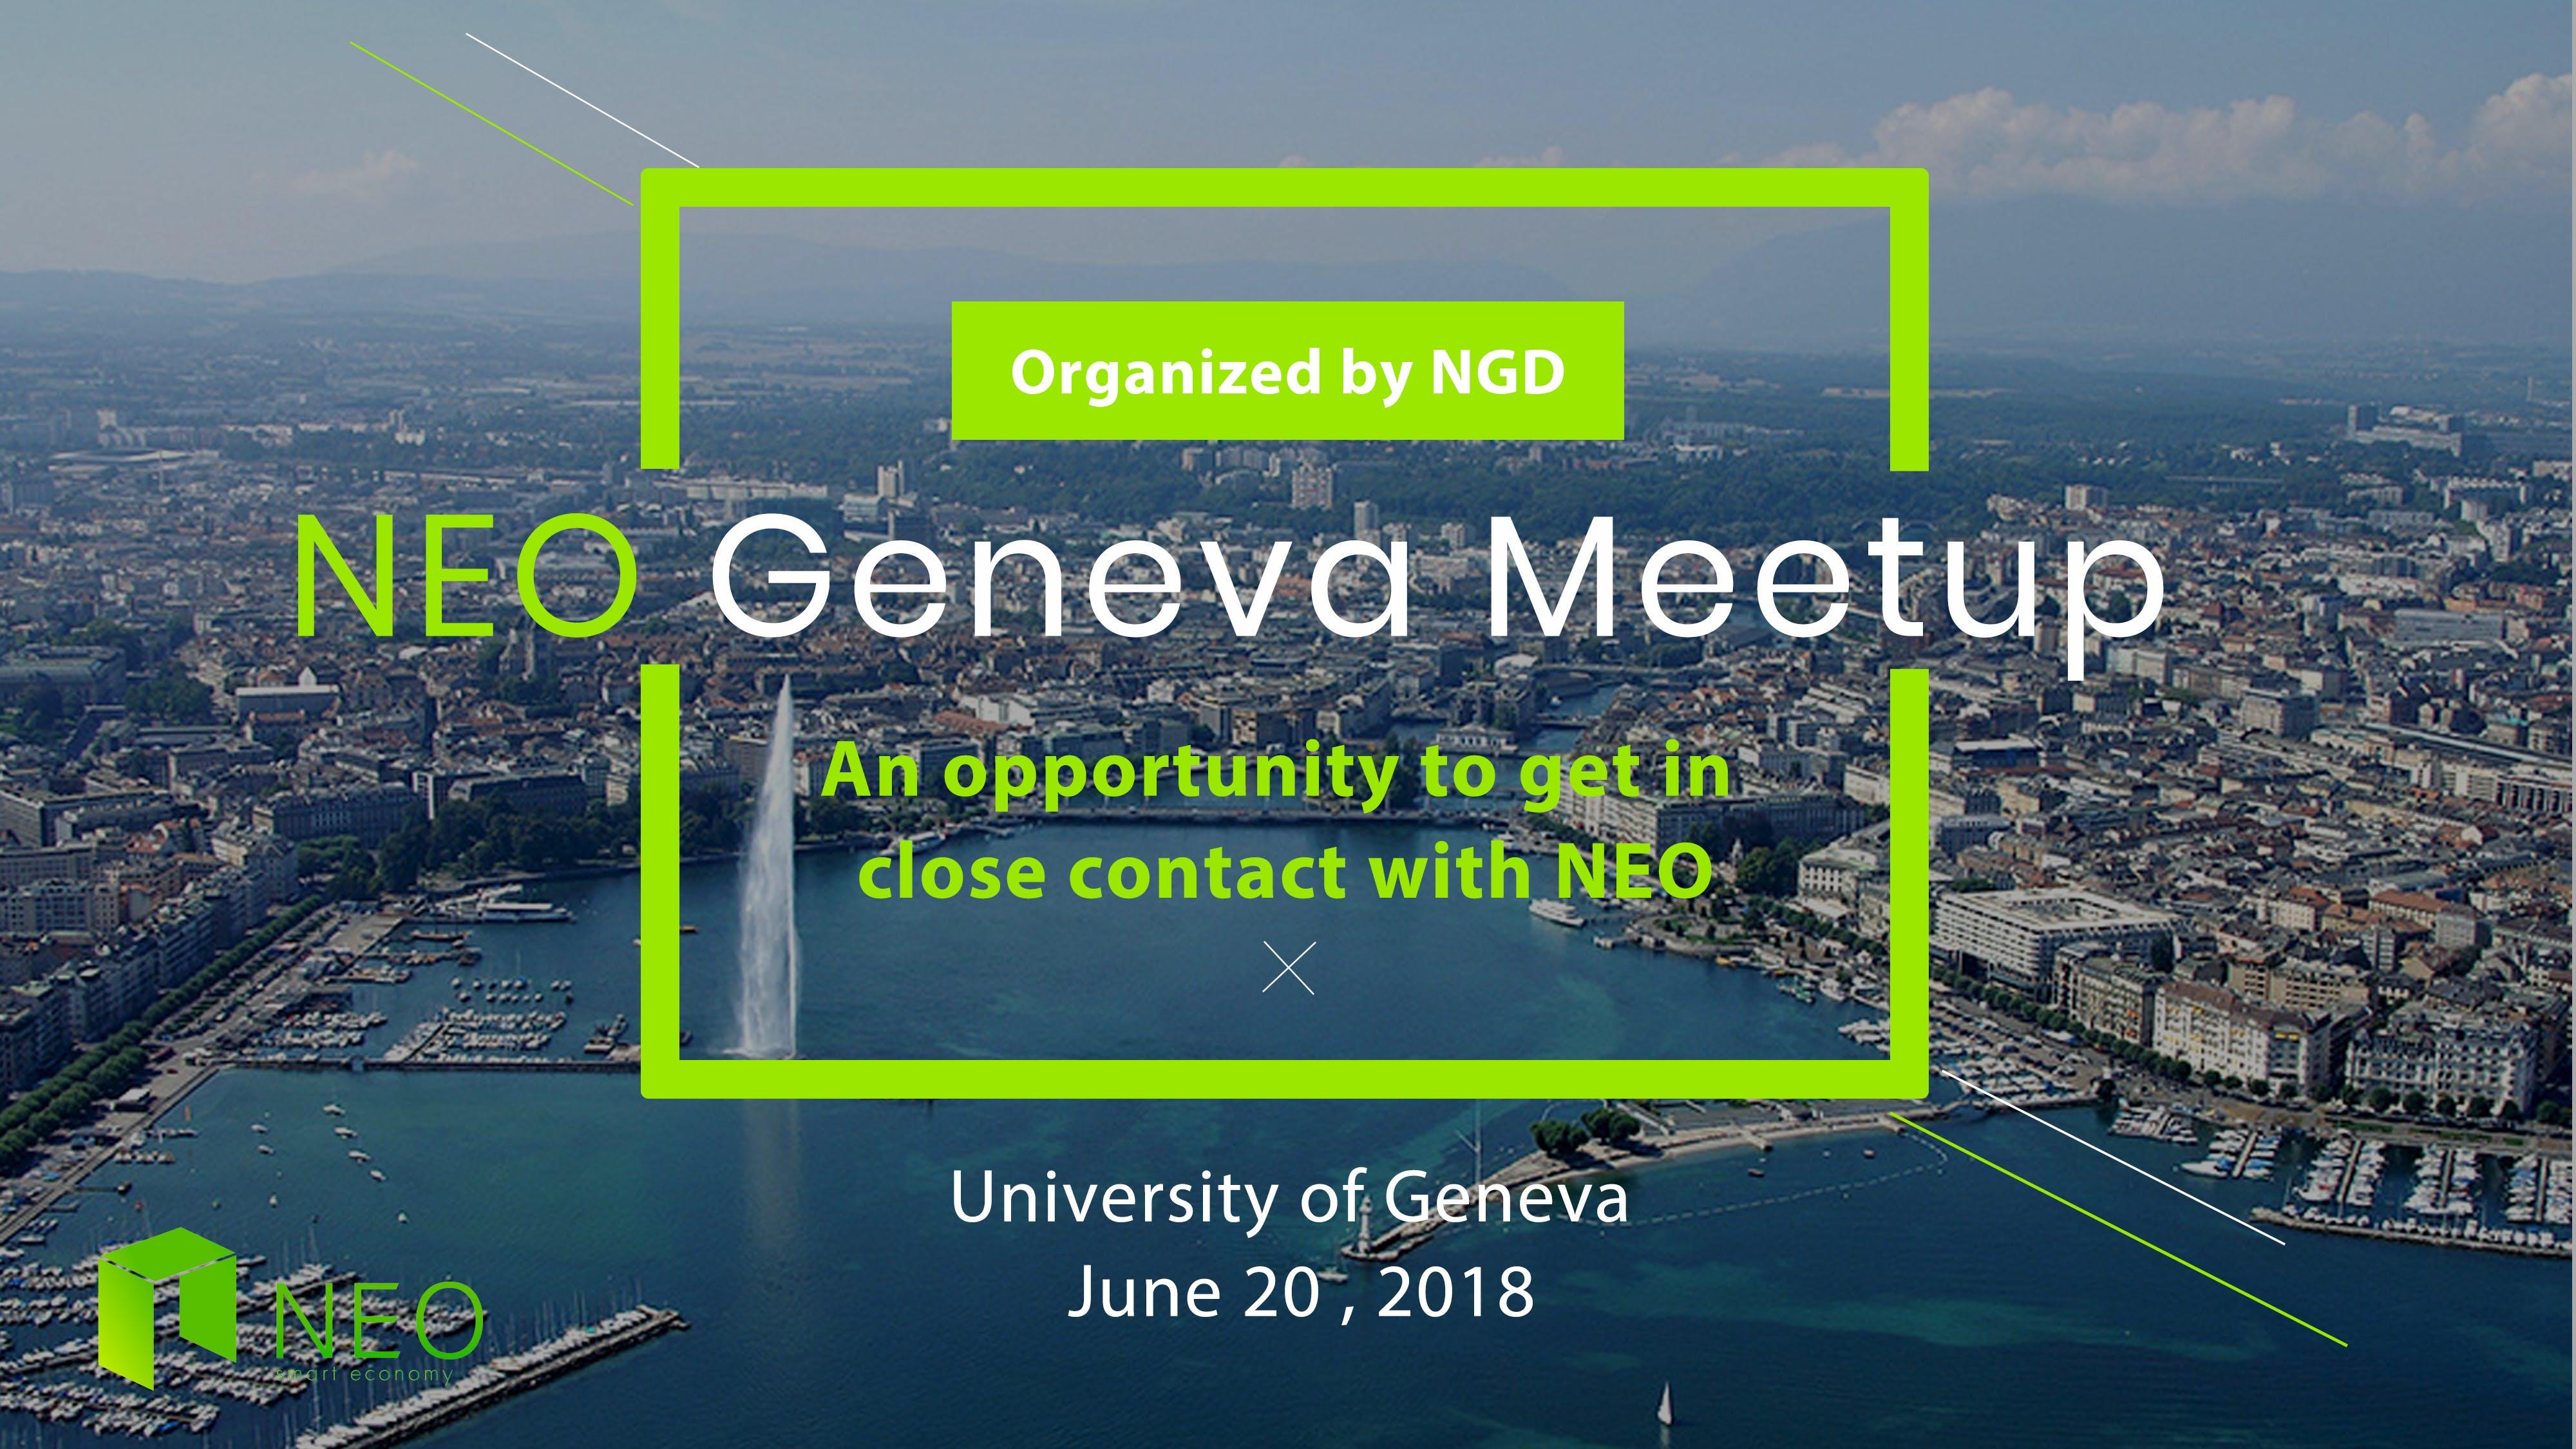 NEO Geneva Meetup